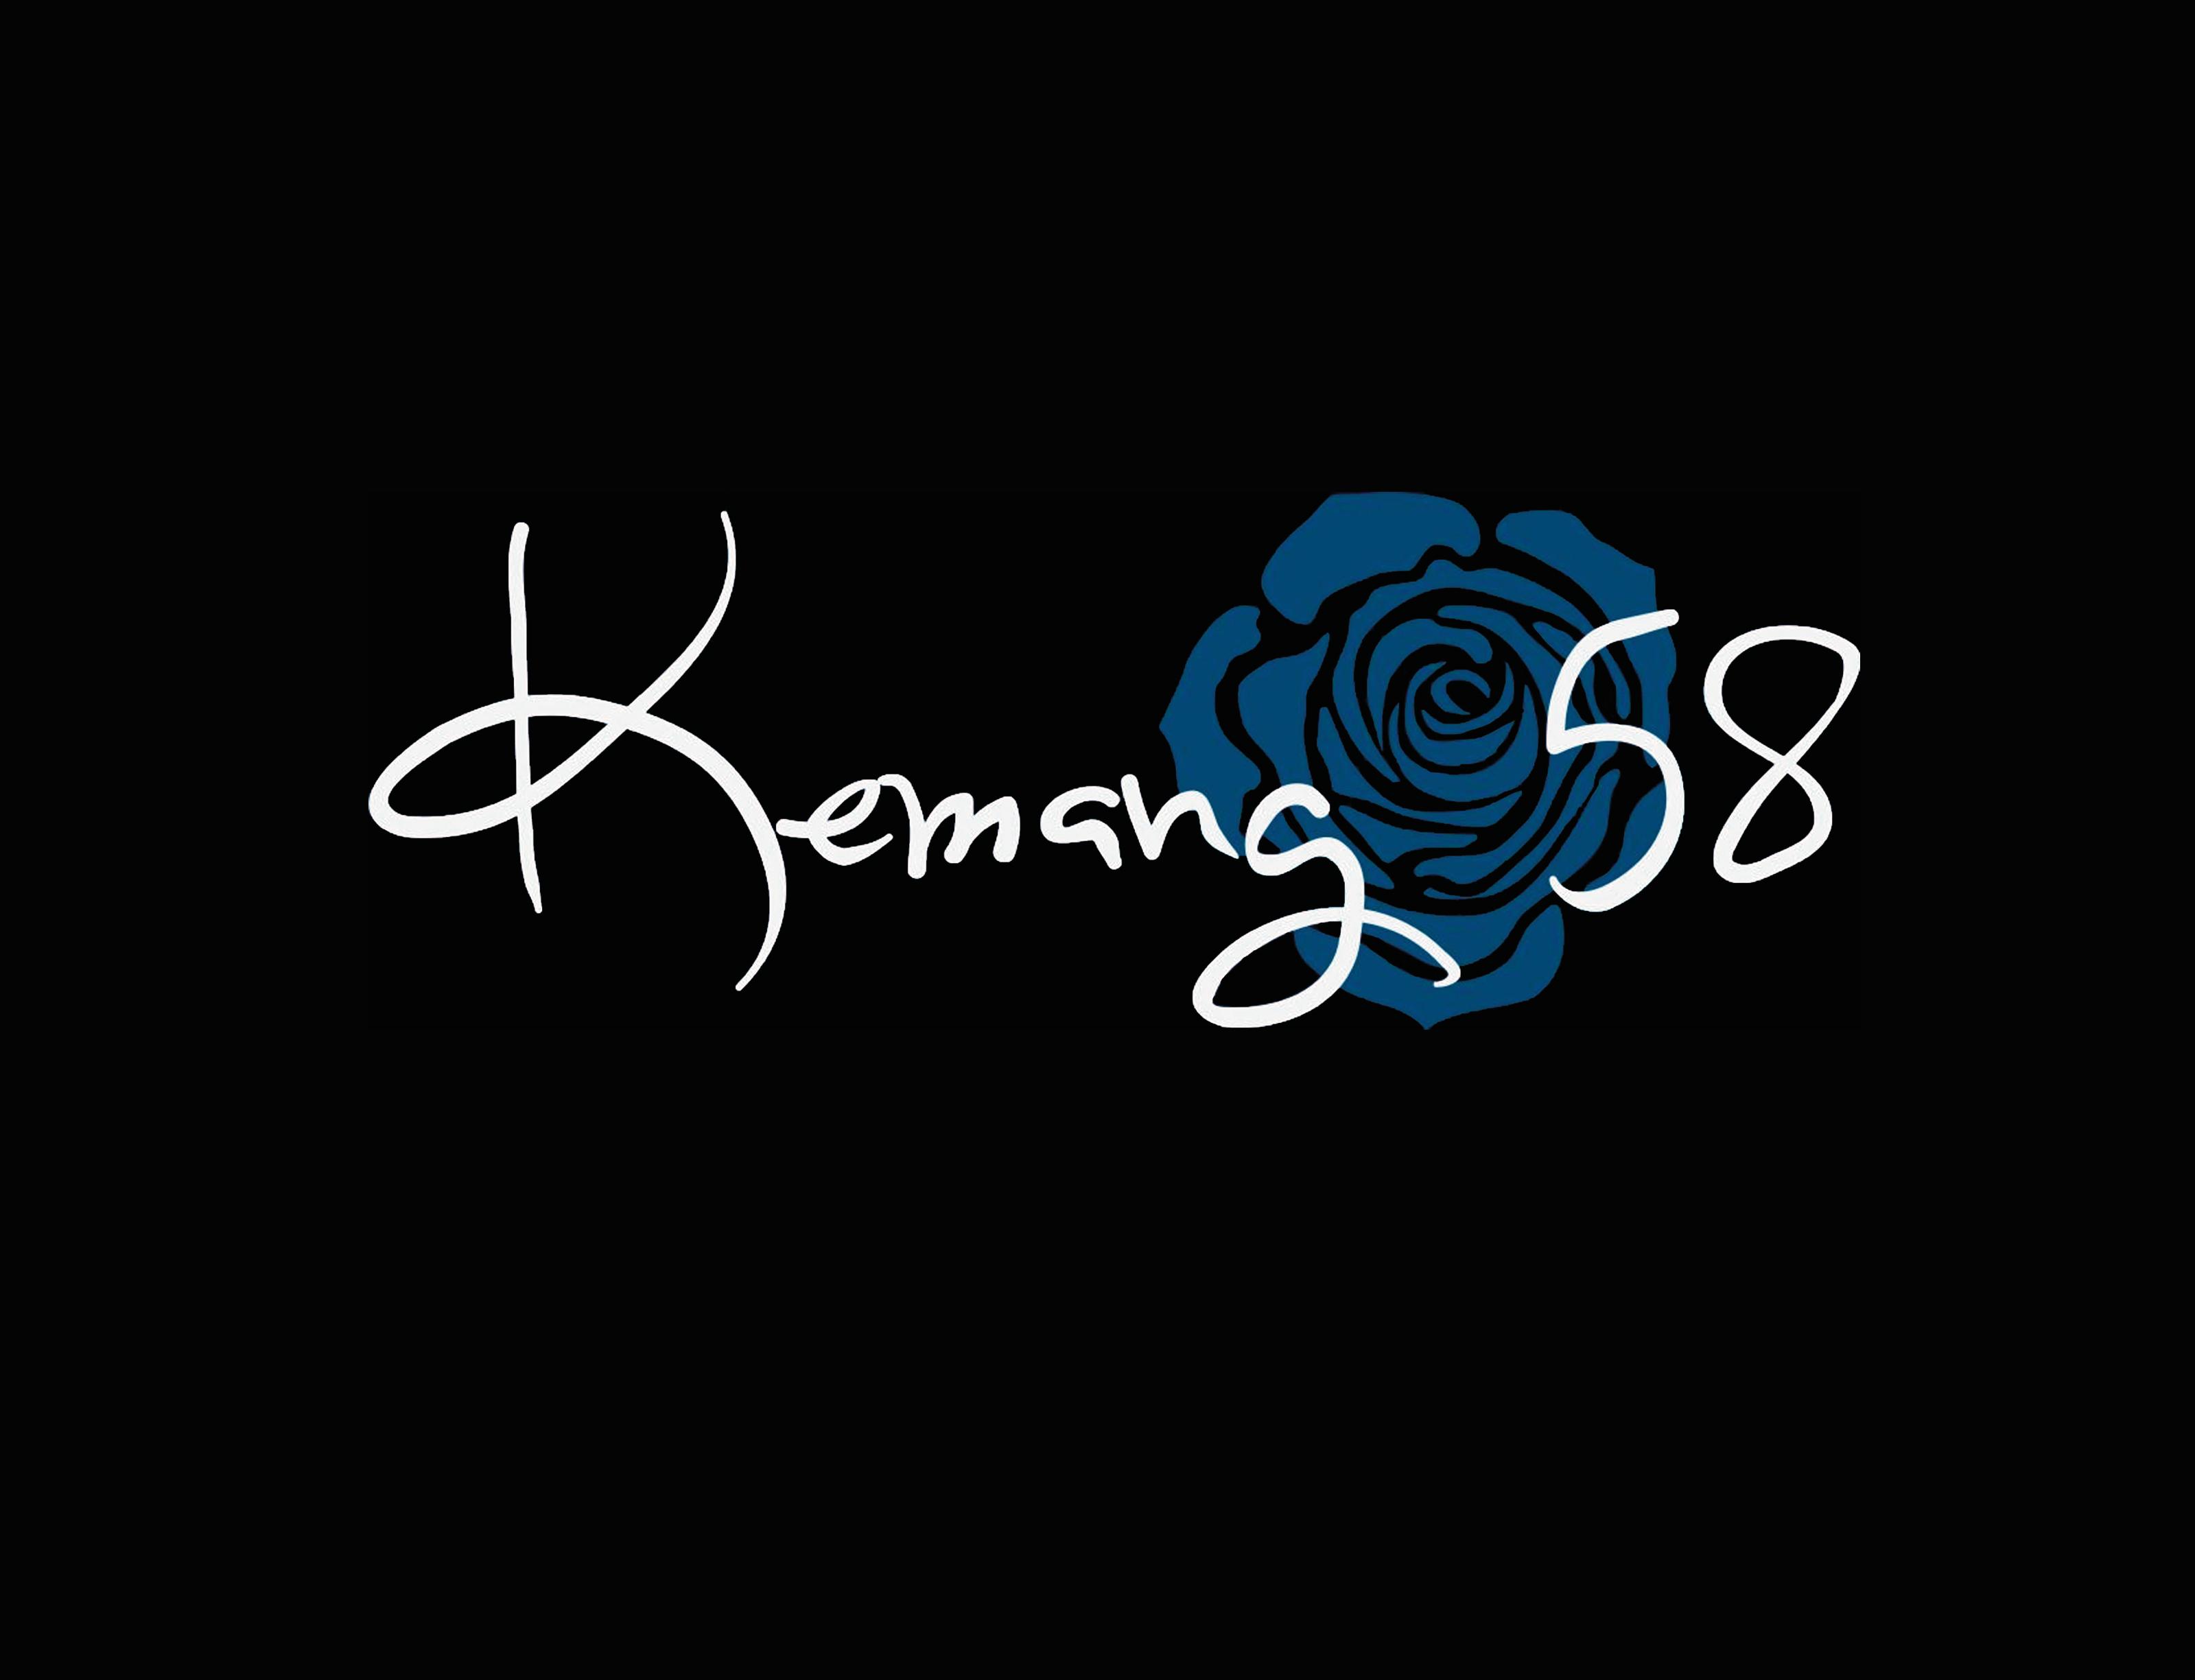 Gallery_Kemang_58